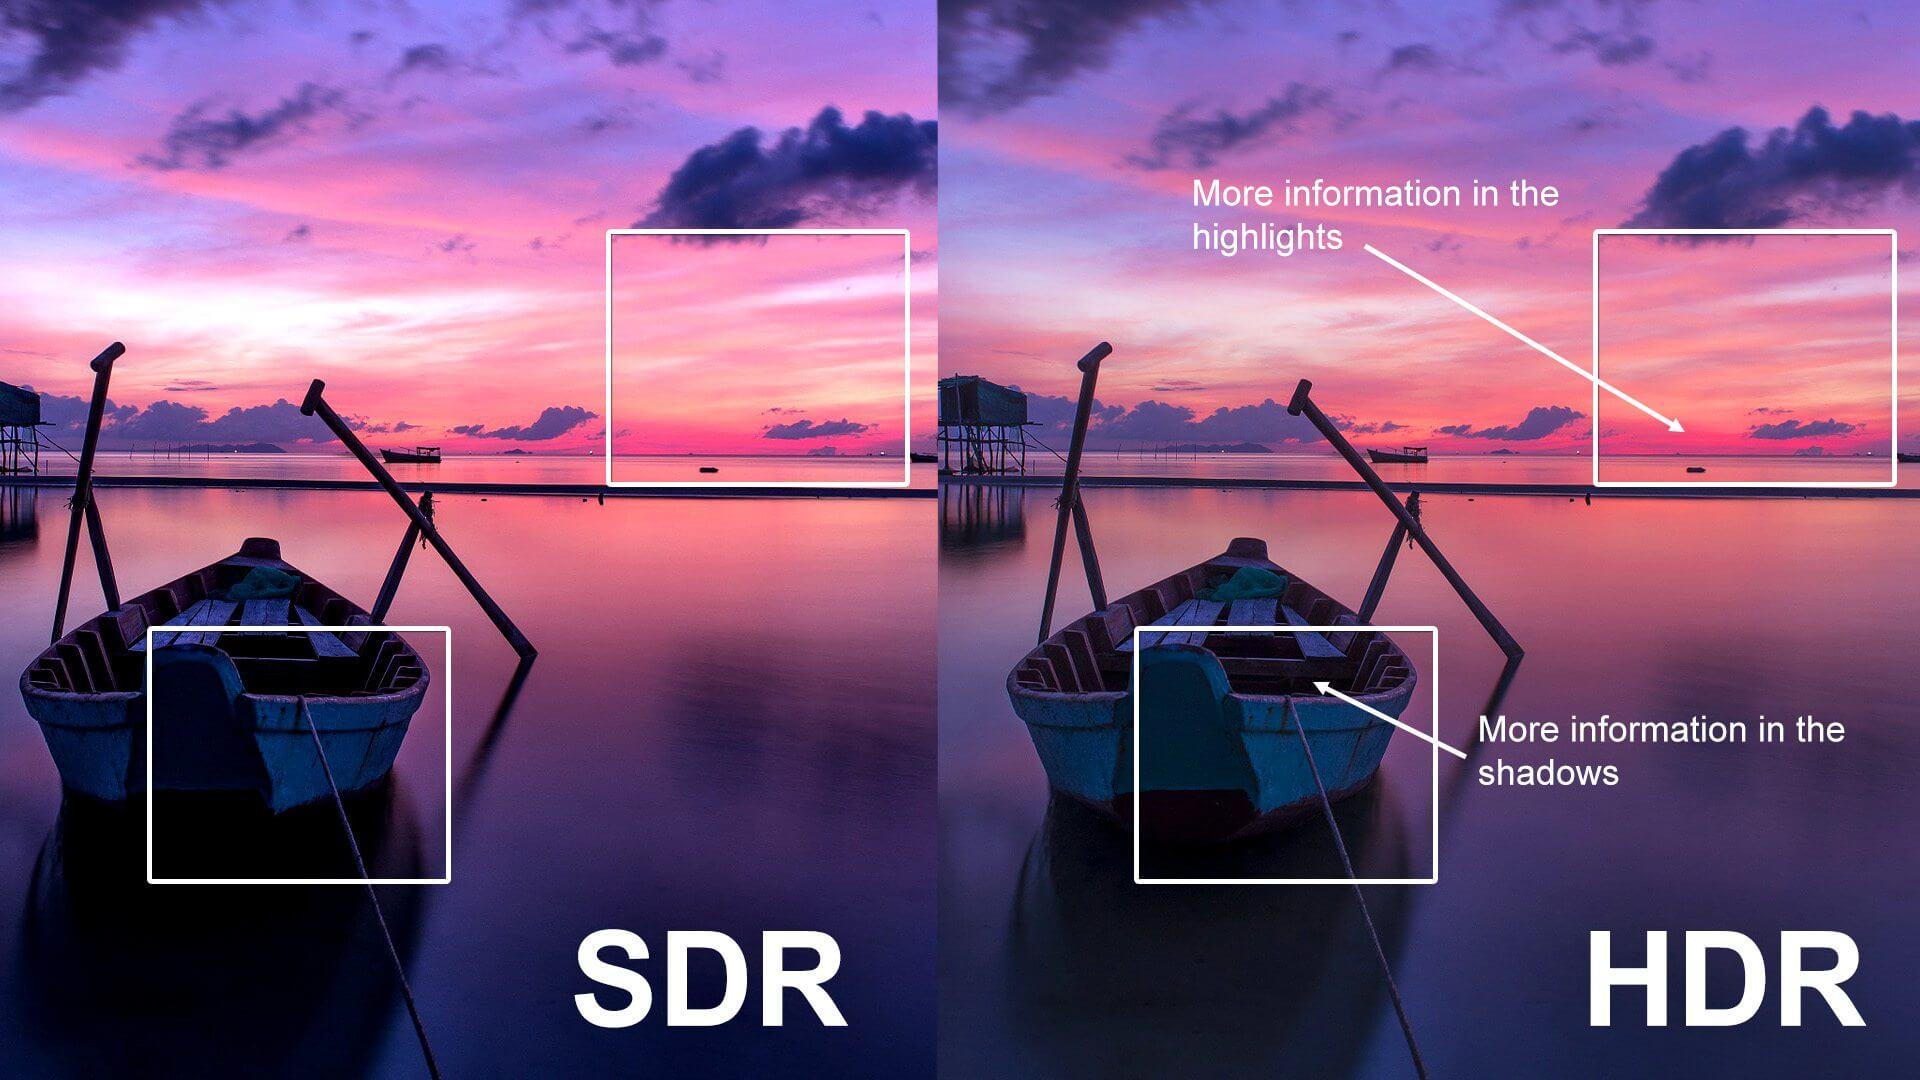 HDR - porównanie